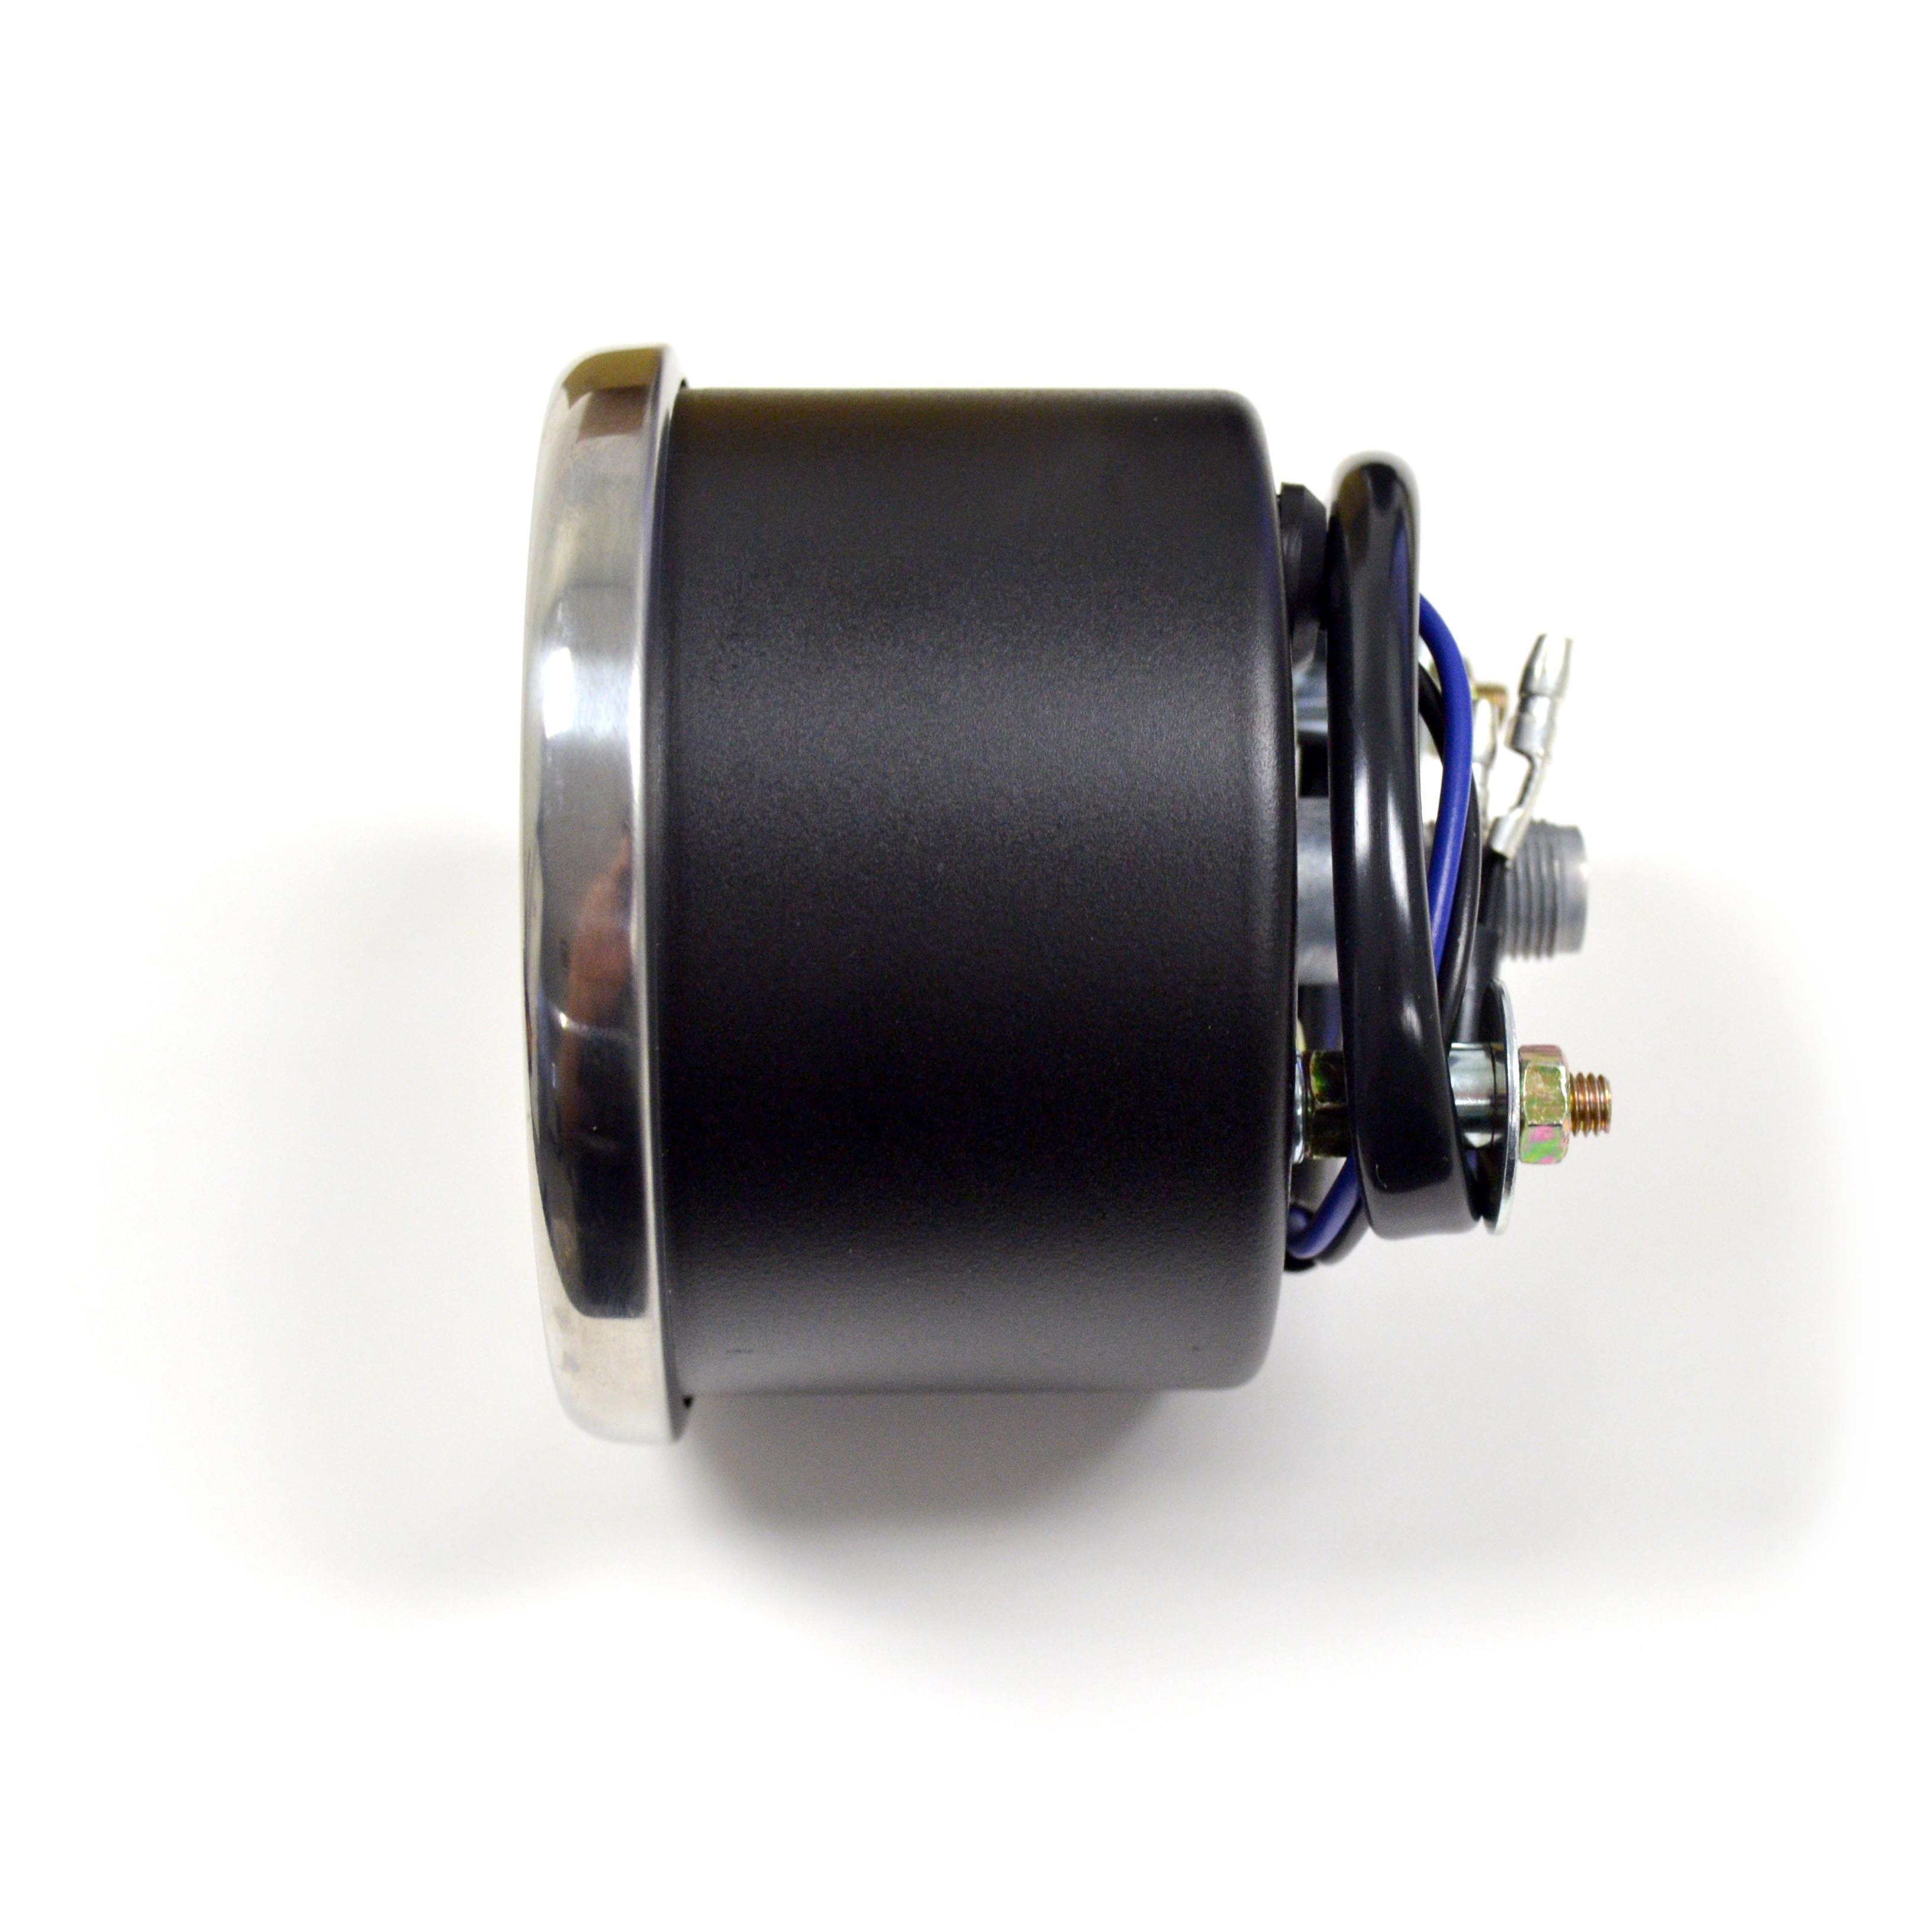 kawasaki h1 mach iii replica reproduction speedo kph speedometer gauge. Black Bedroom Furniture Sets. Home Design Ideas